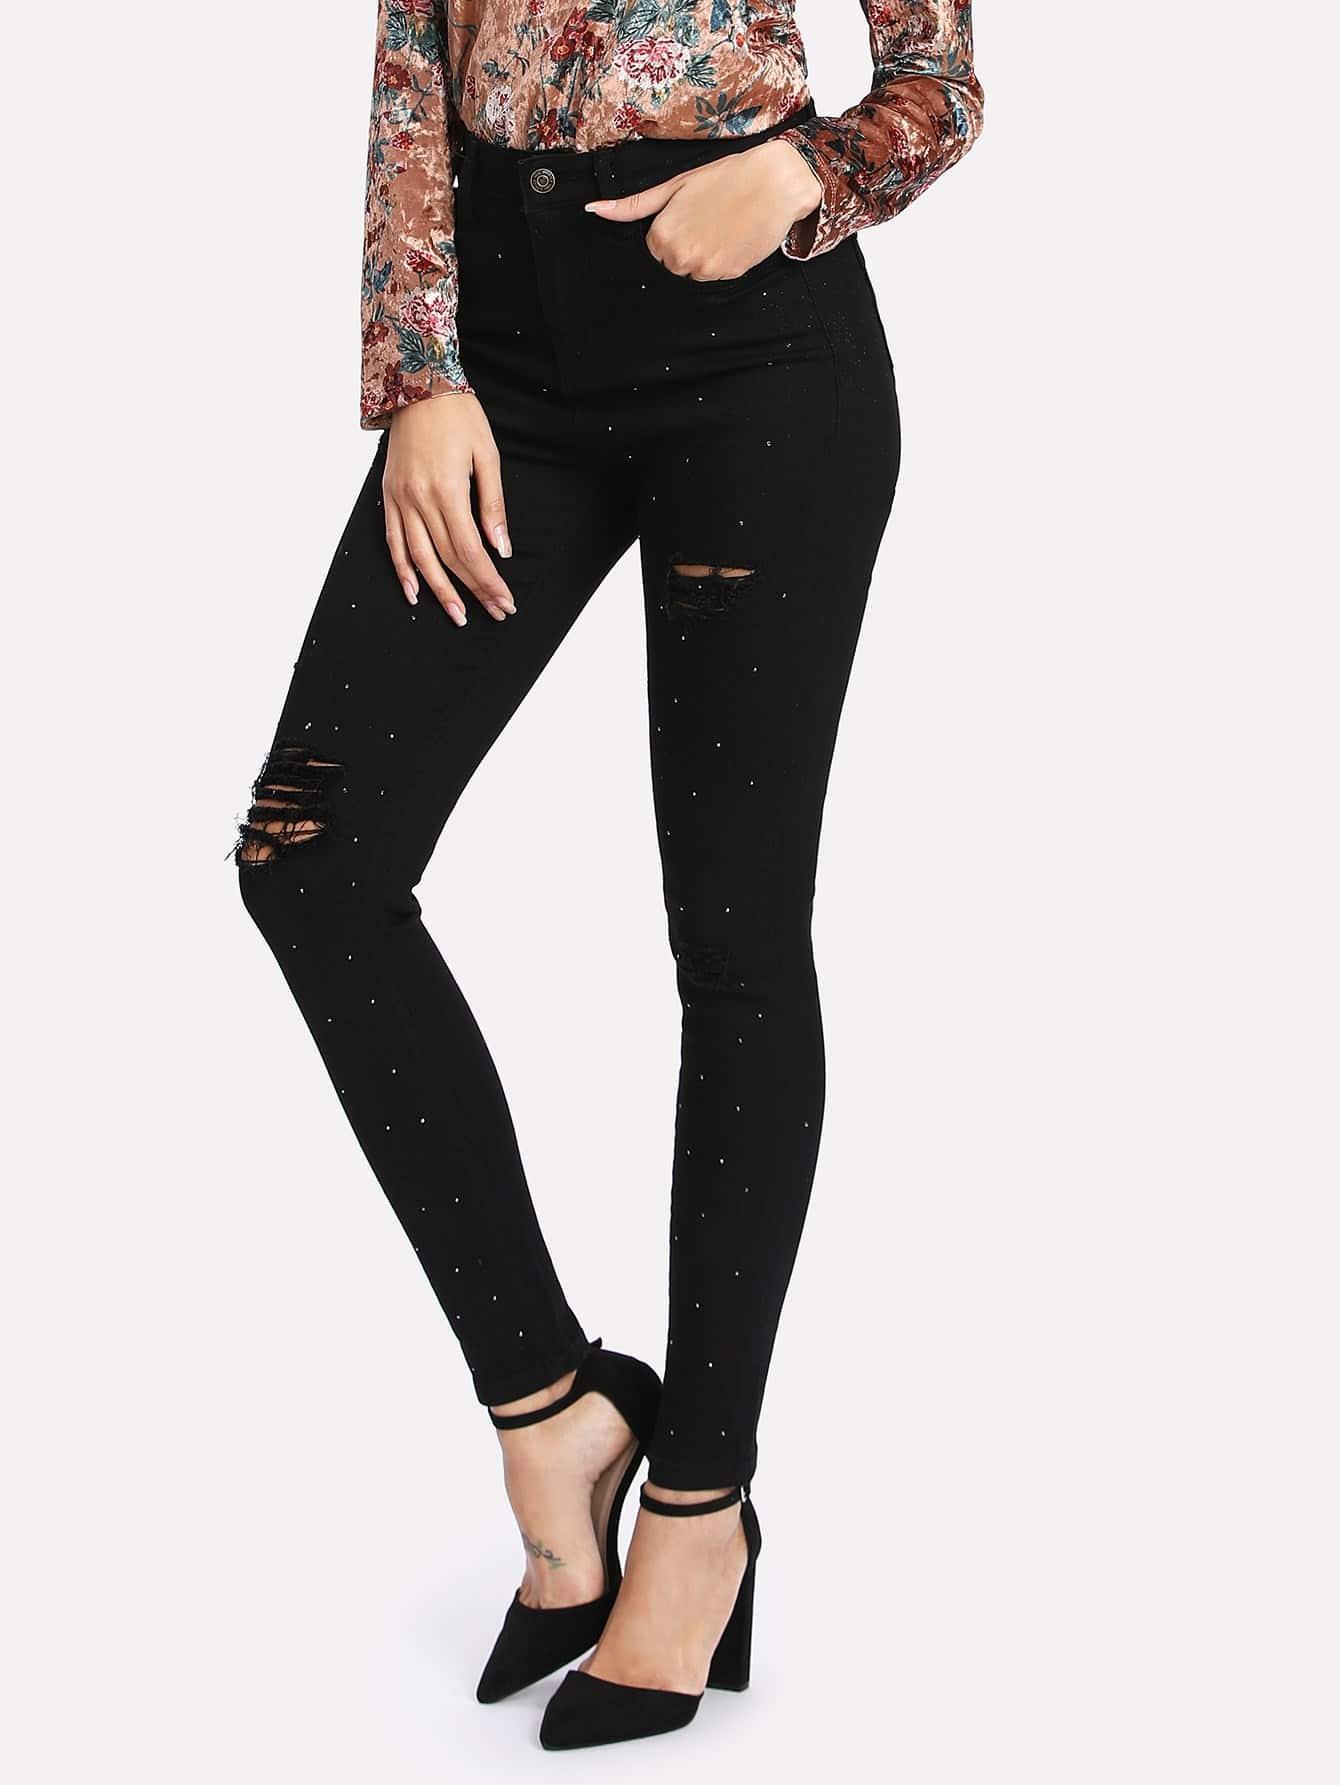 Rhinestone Ripped Skinny Jeans